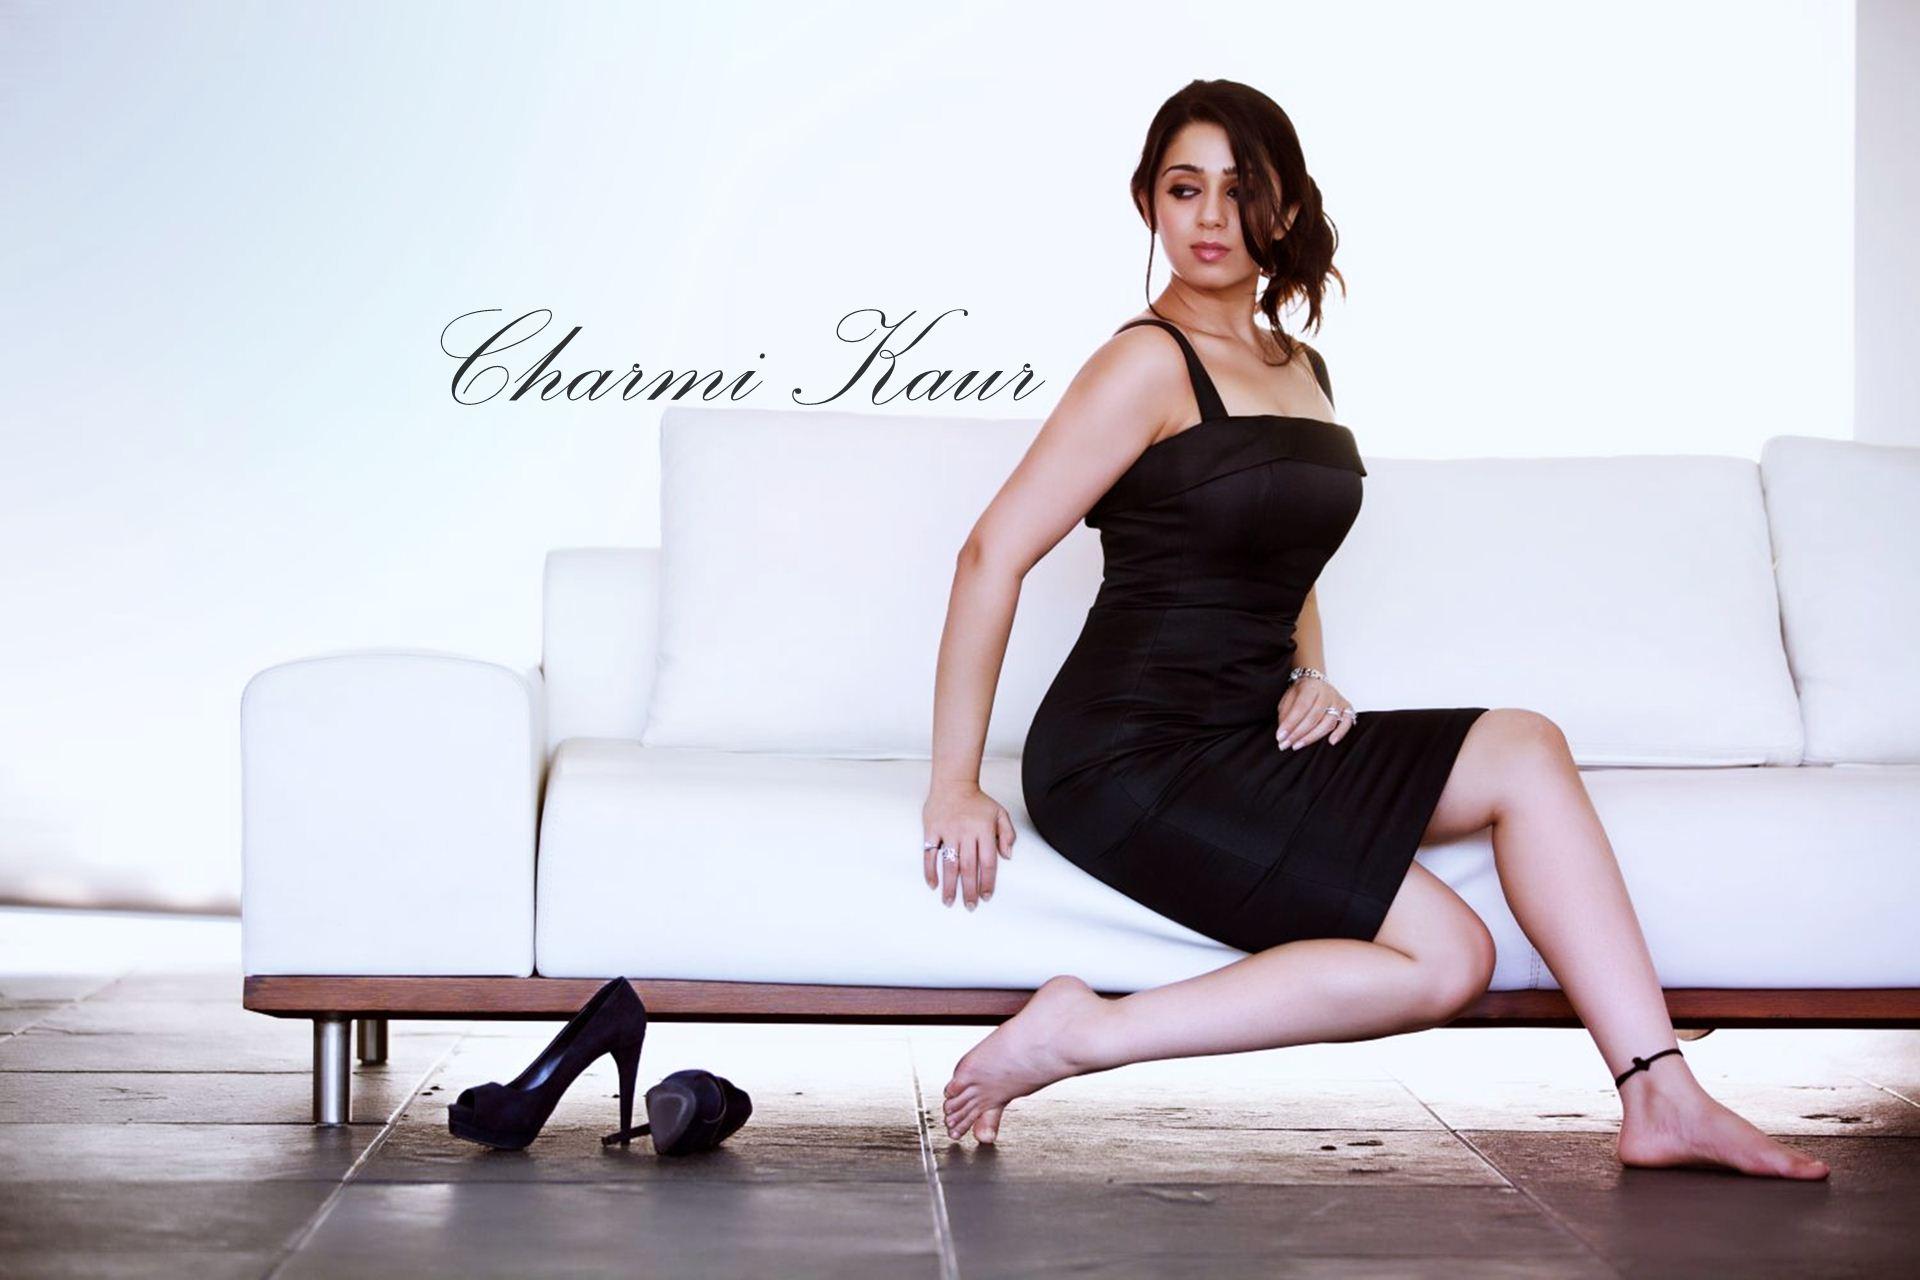 Charmi Kaur sexy pics